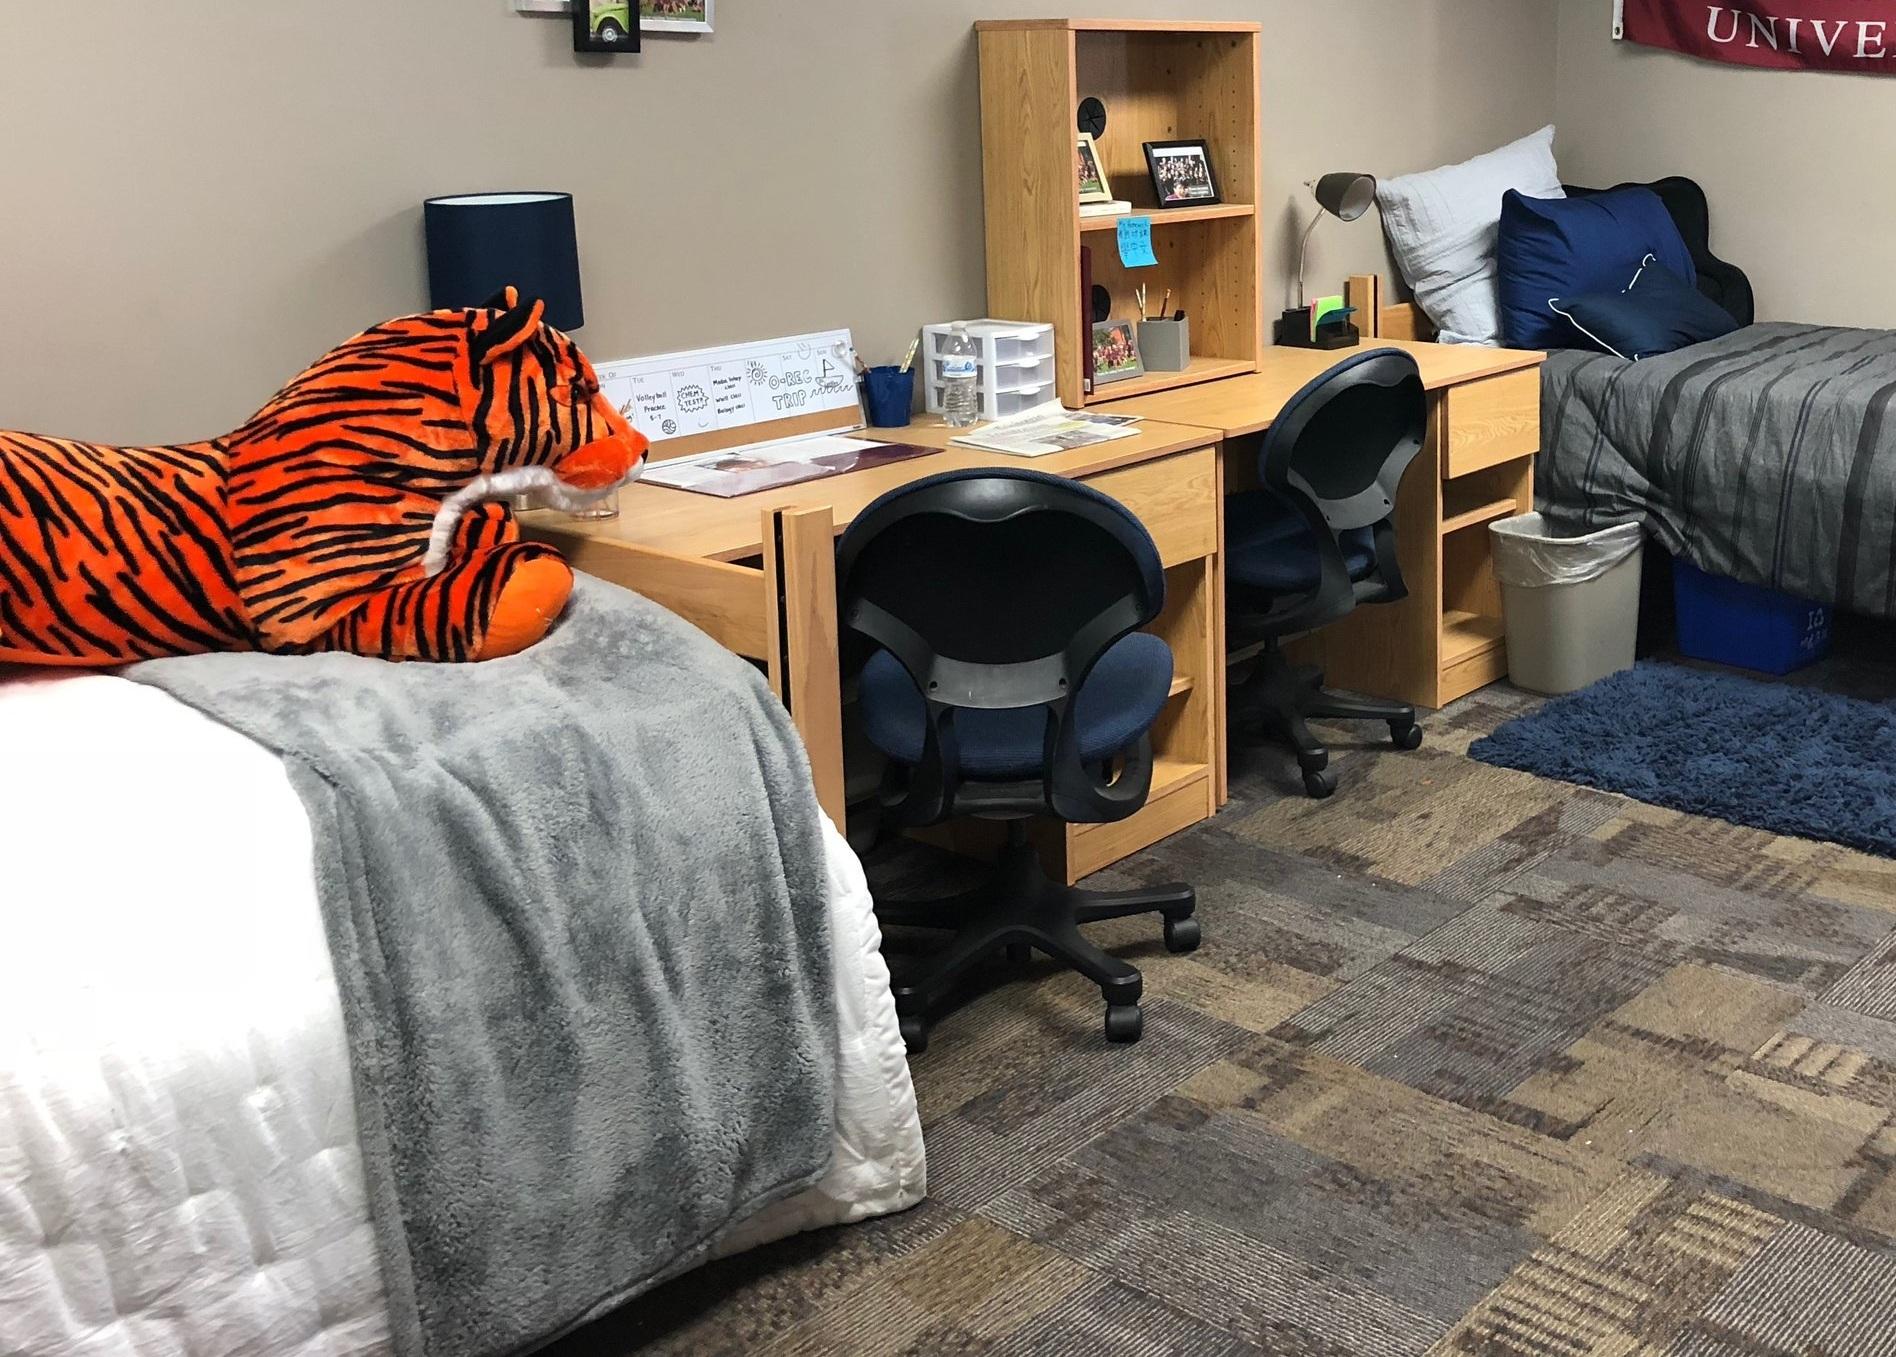 A college dorm room.